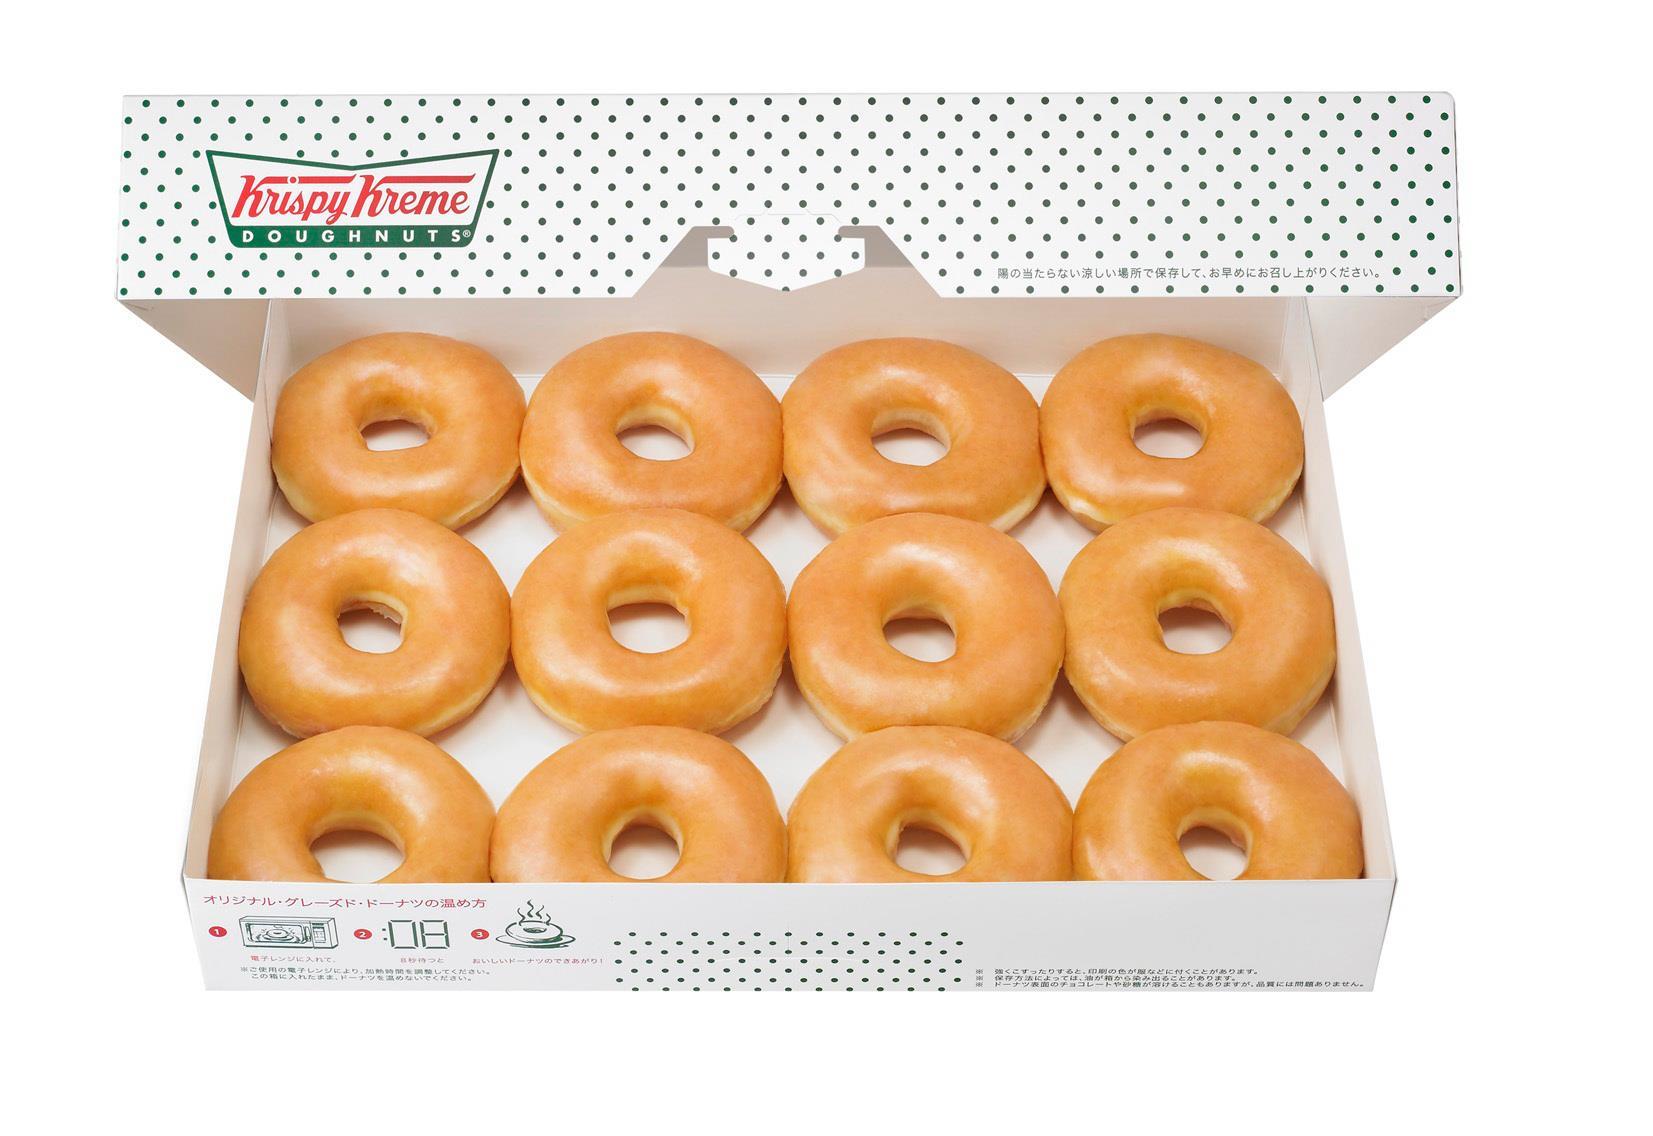 Krispy Kreme Original Glazed.jpg